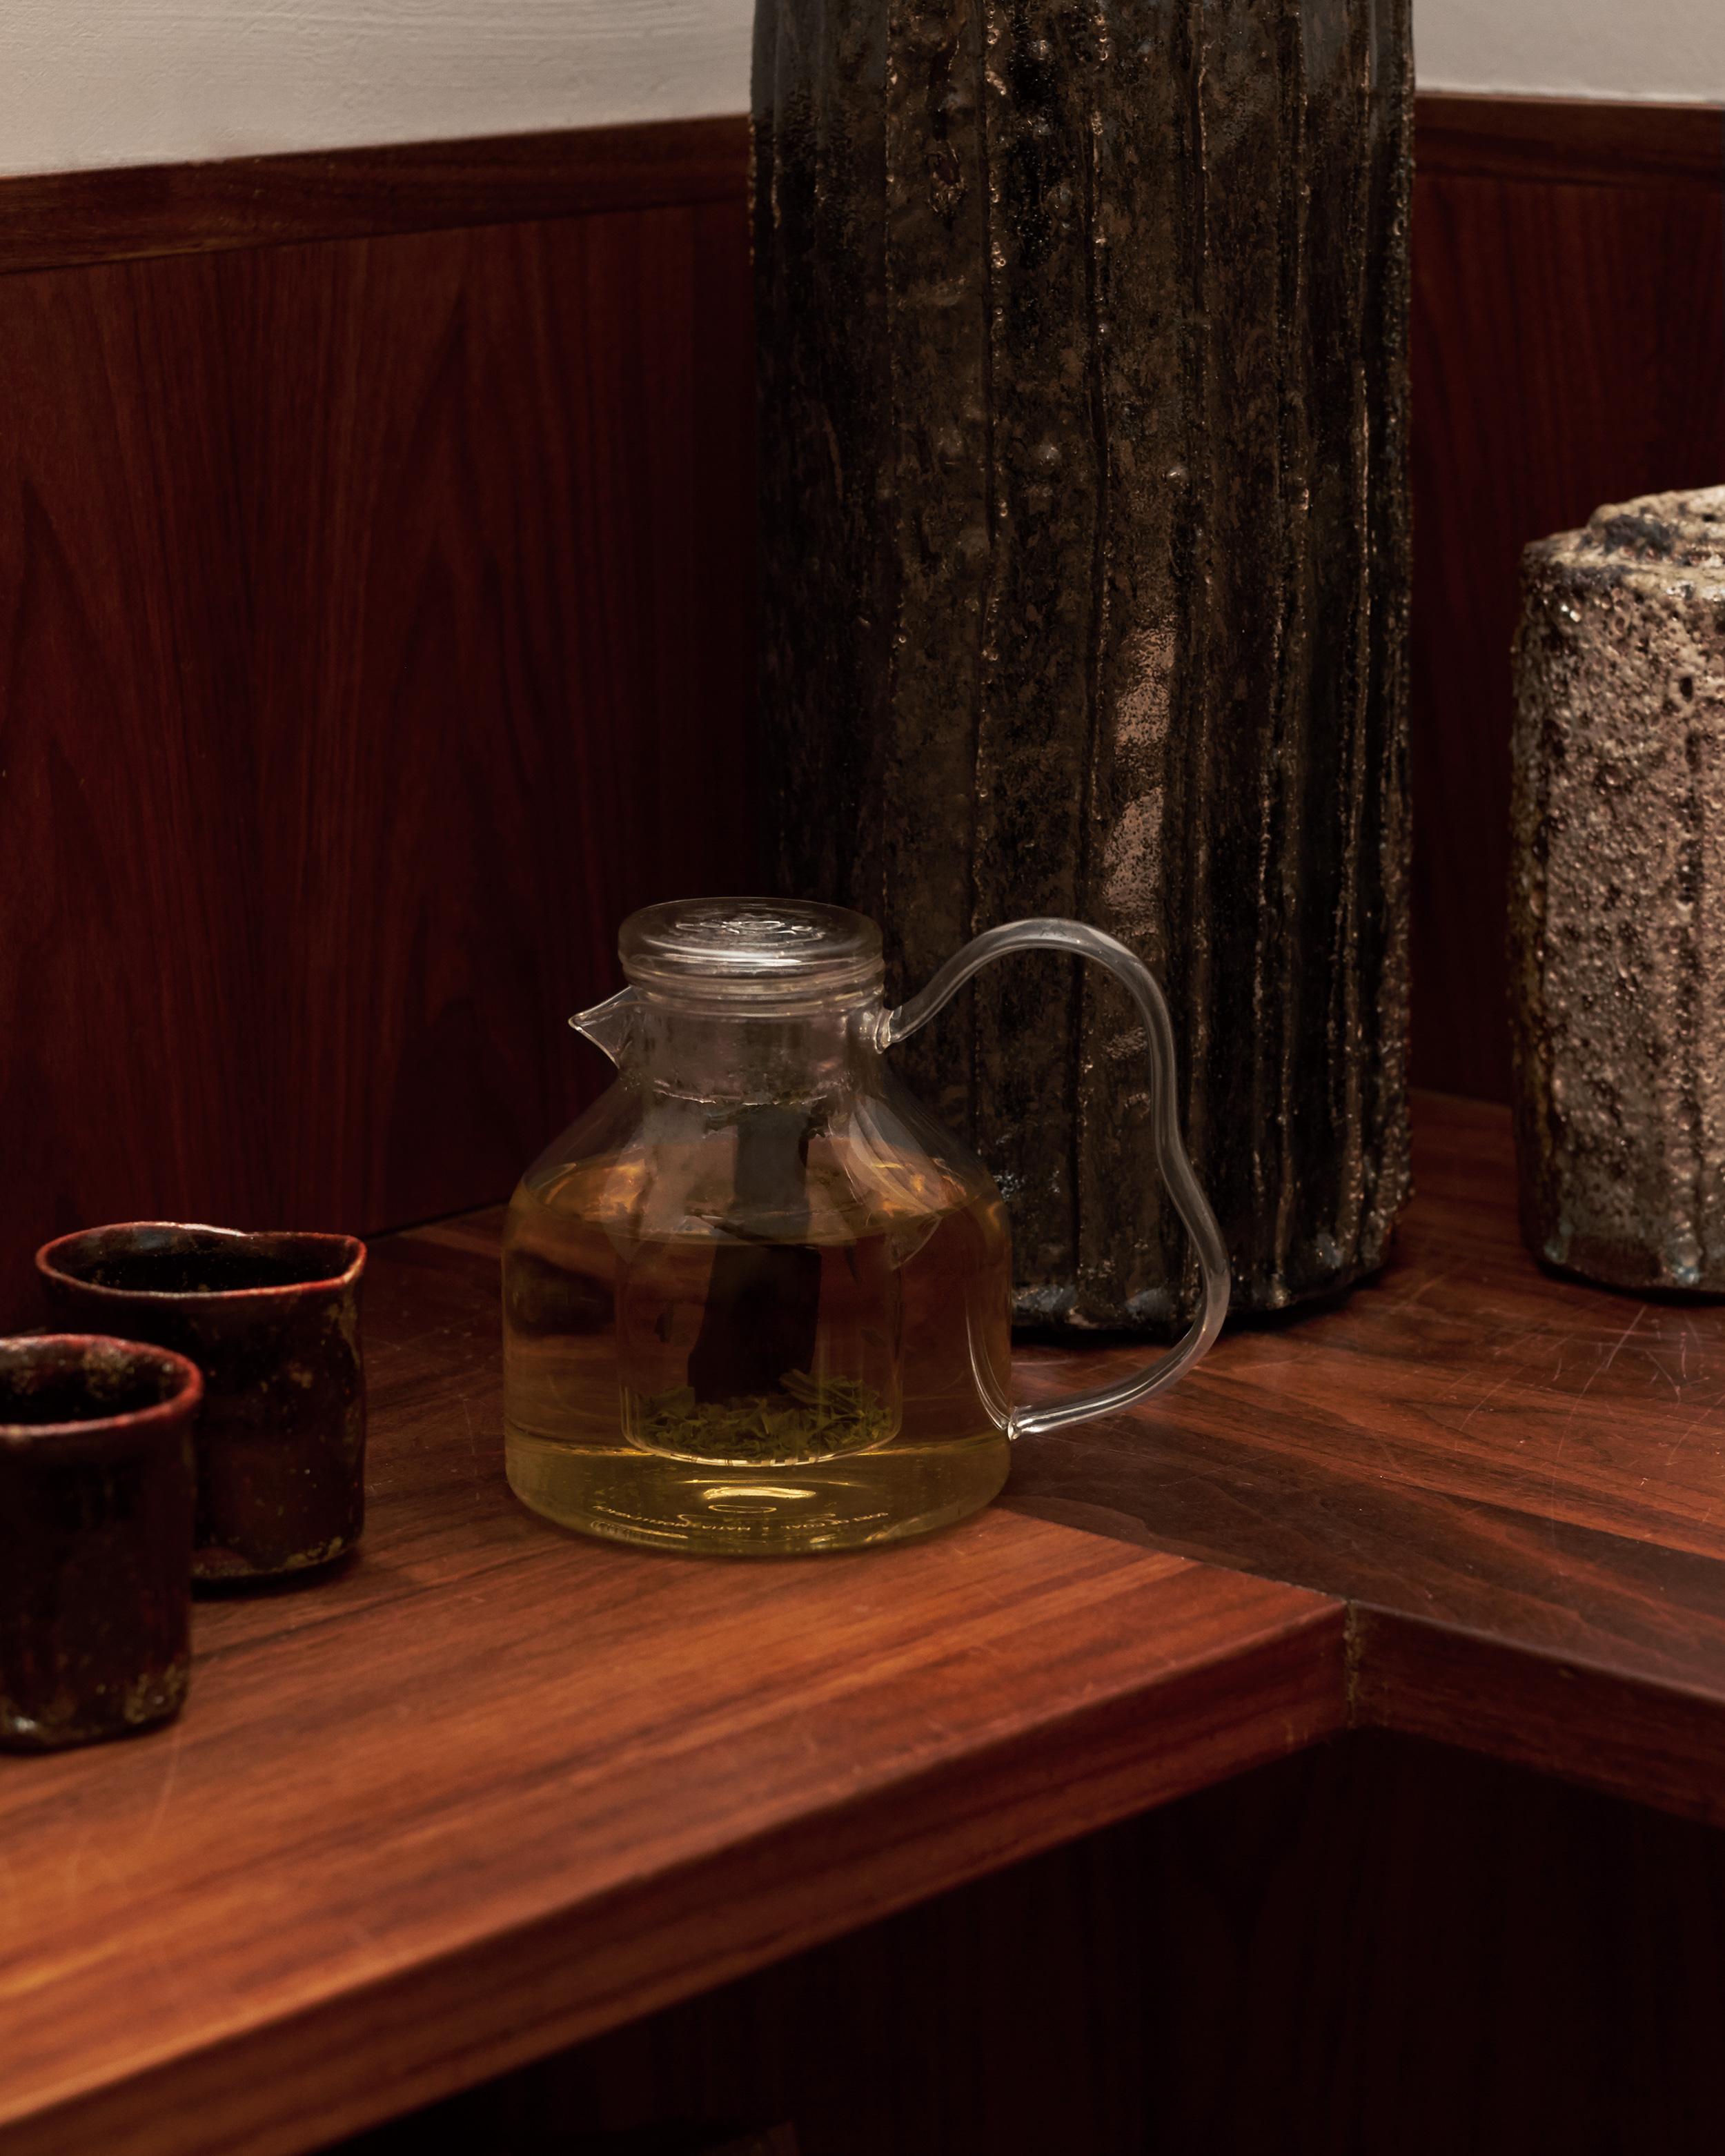 Teapot-7-copy.jpg